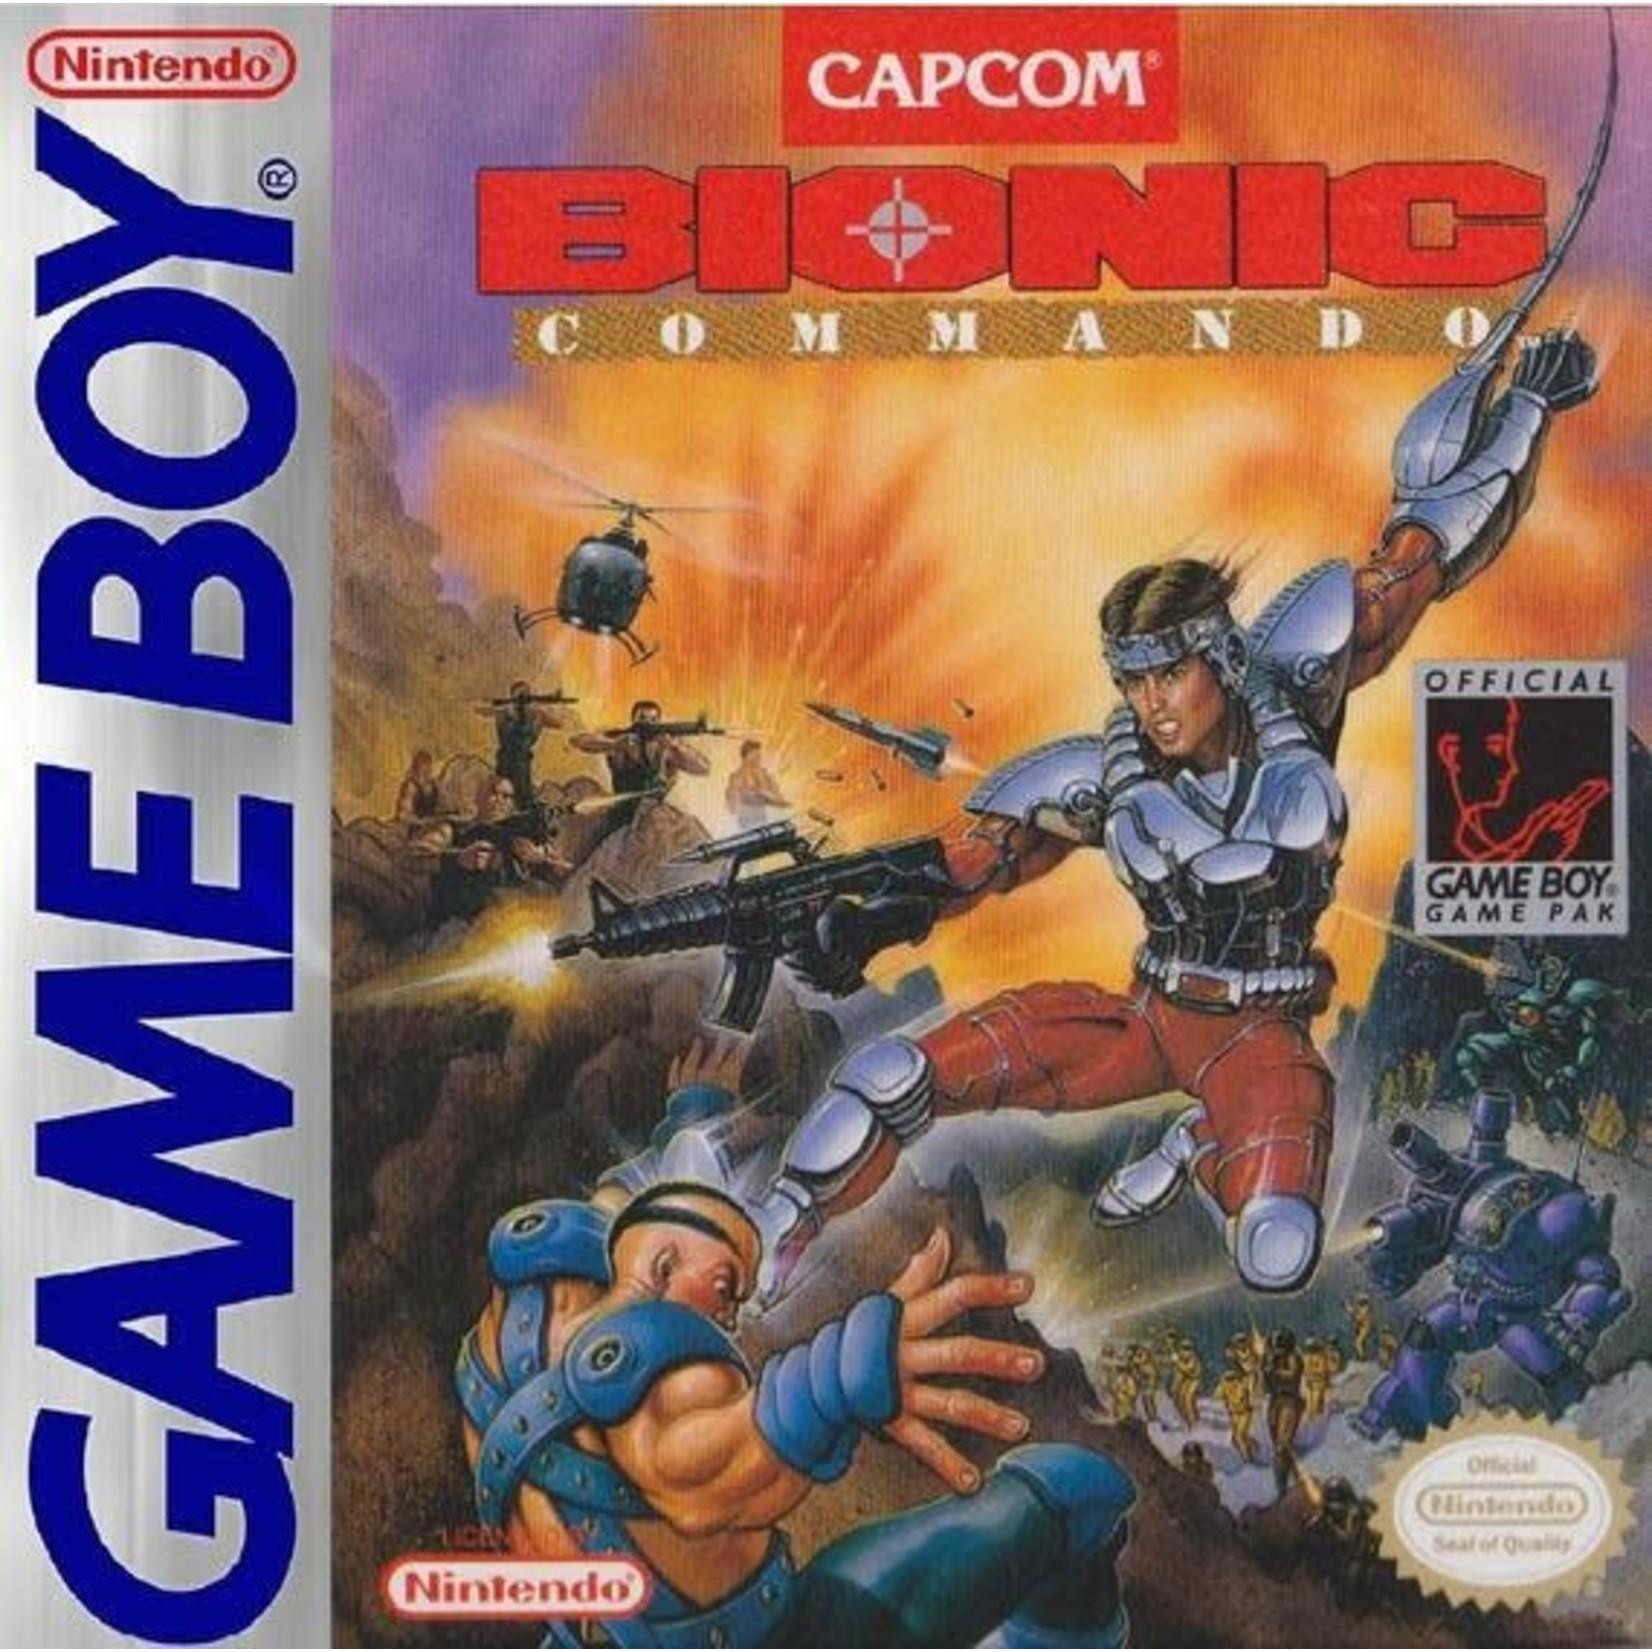 GBU-Bionic Commando